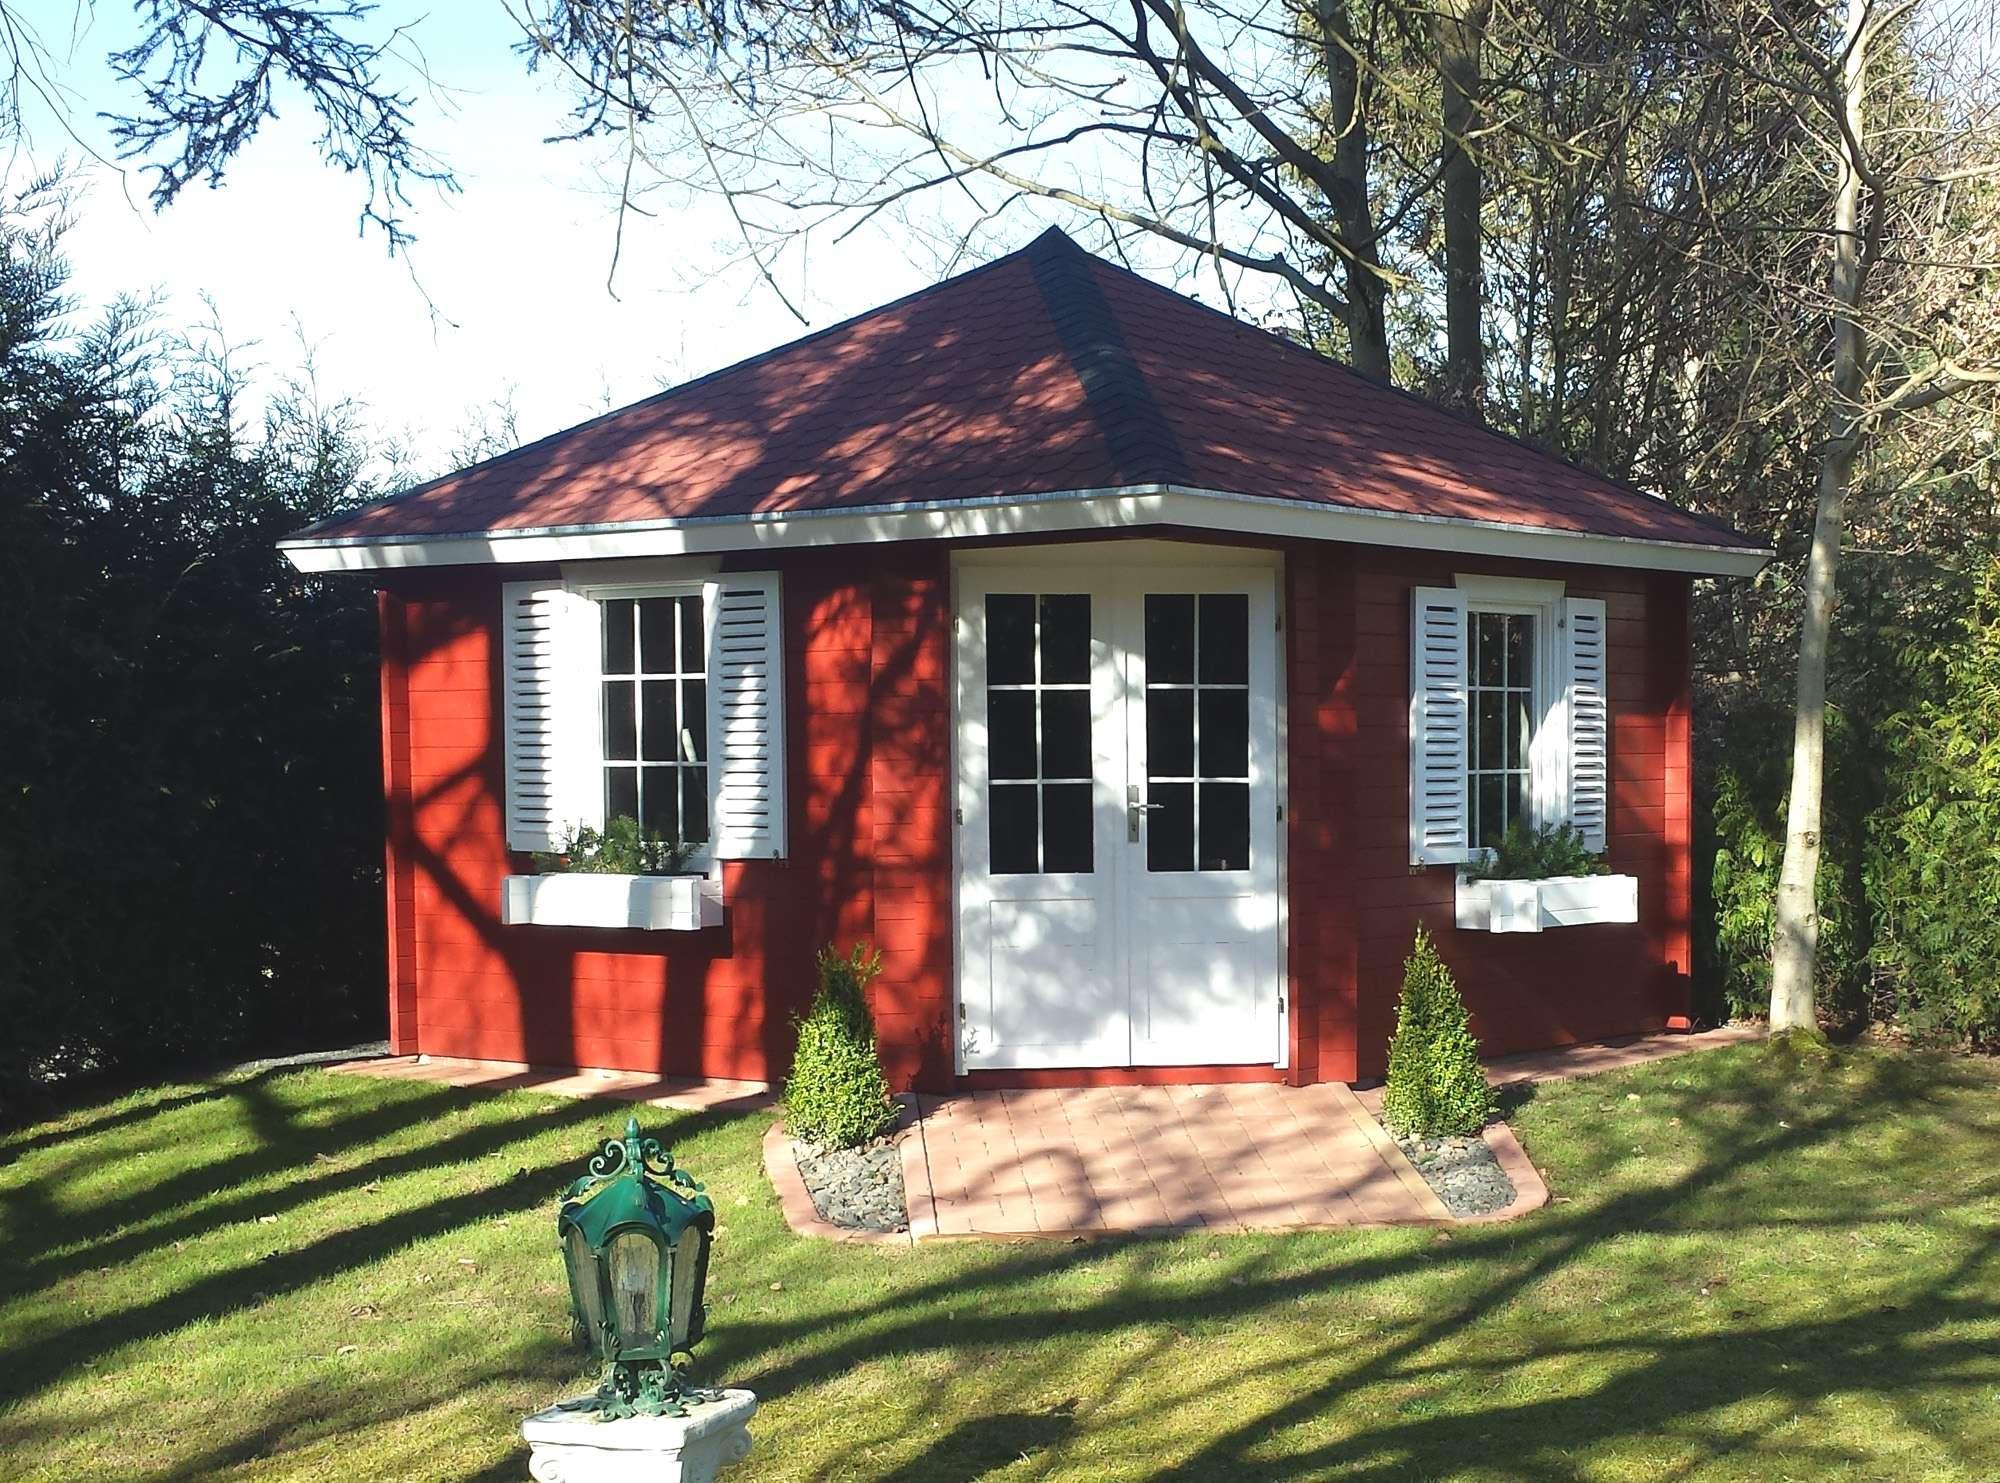 Gartenhaus 4x4m (16qm): Top Auswahl, faire Preise